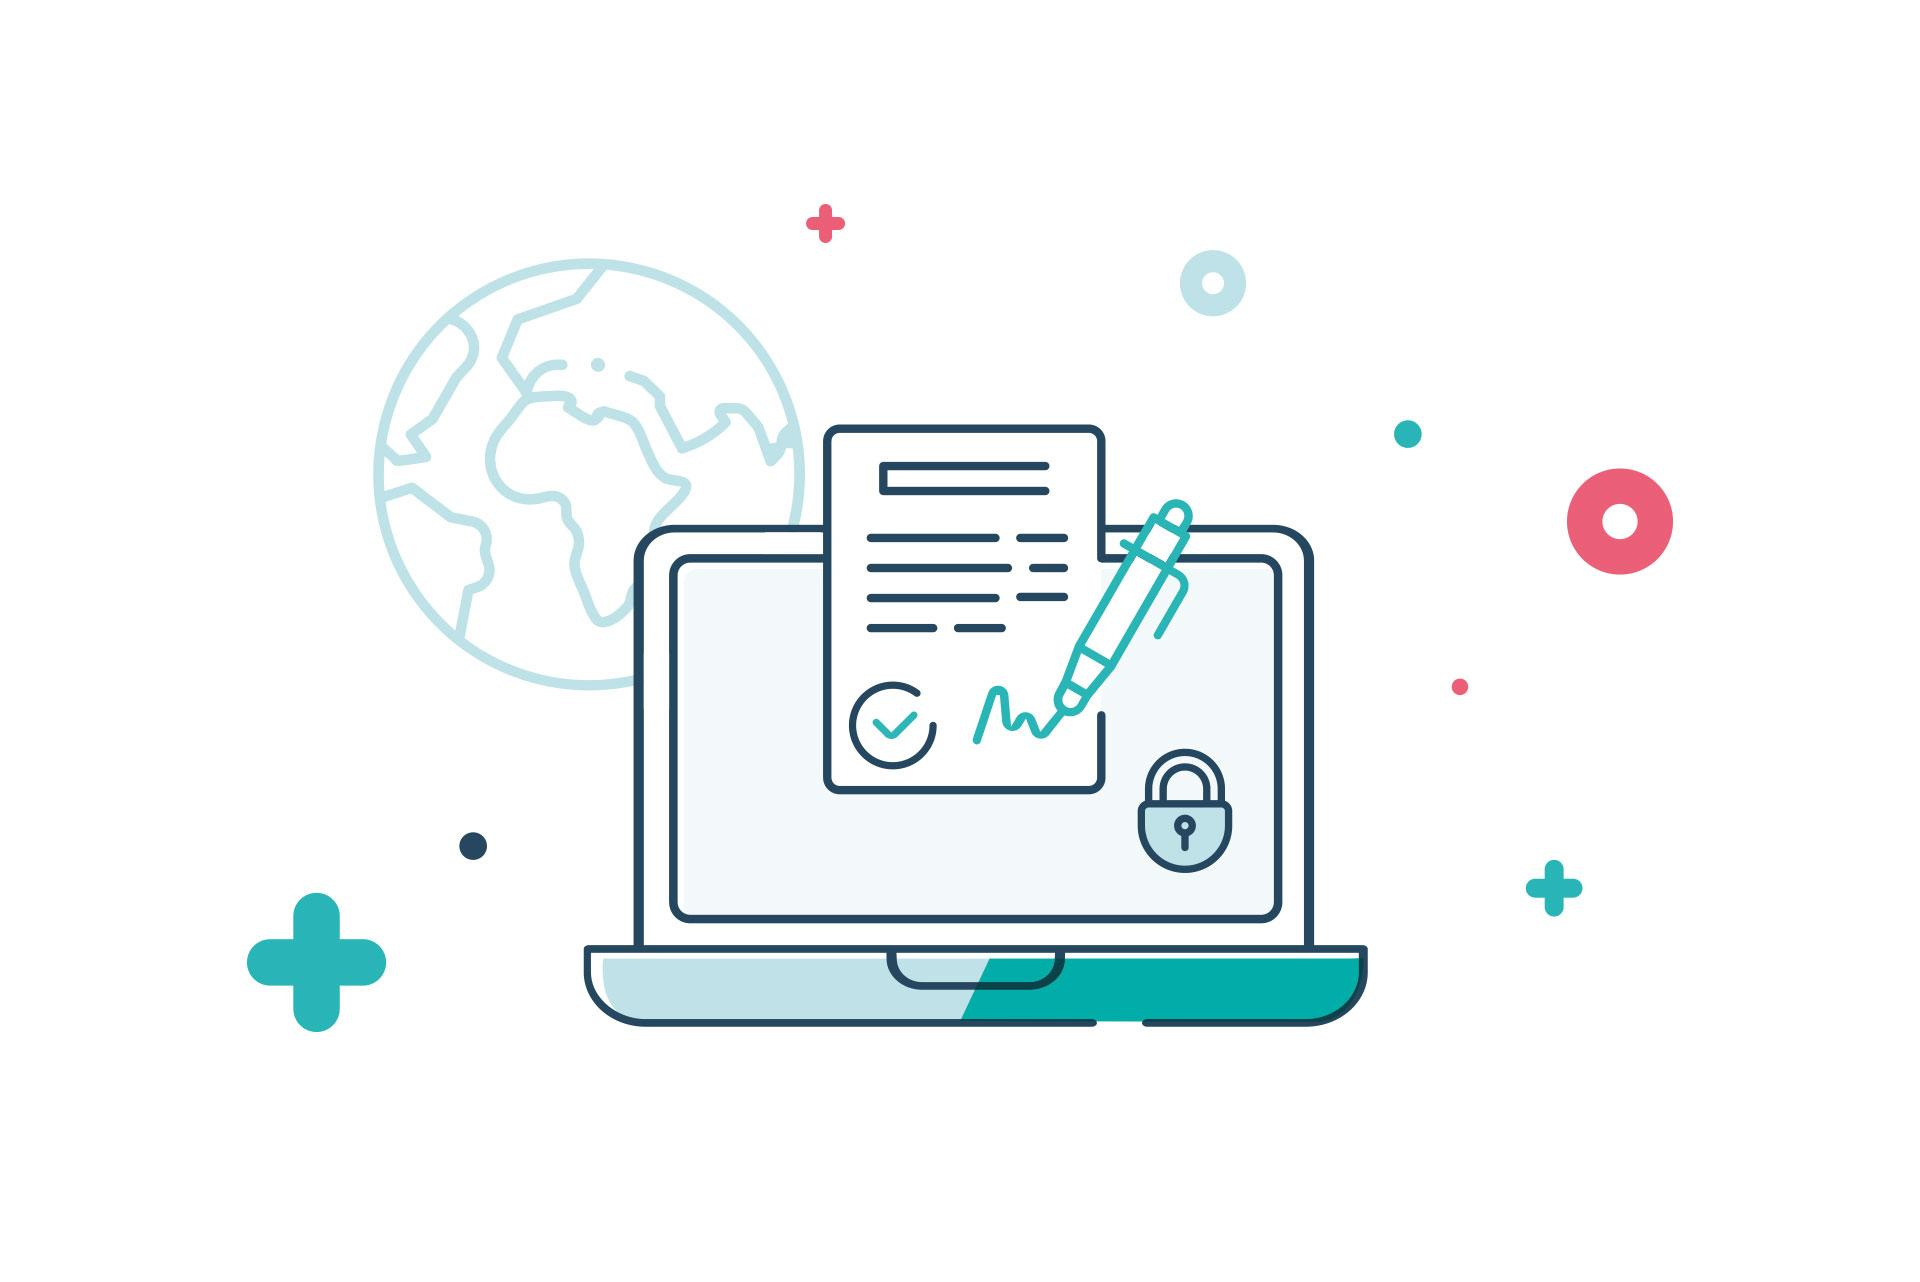 SCOPE Insight e-signature feature